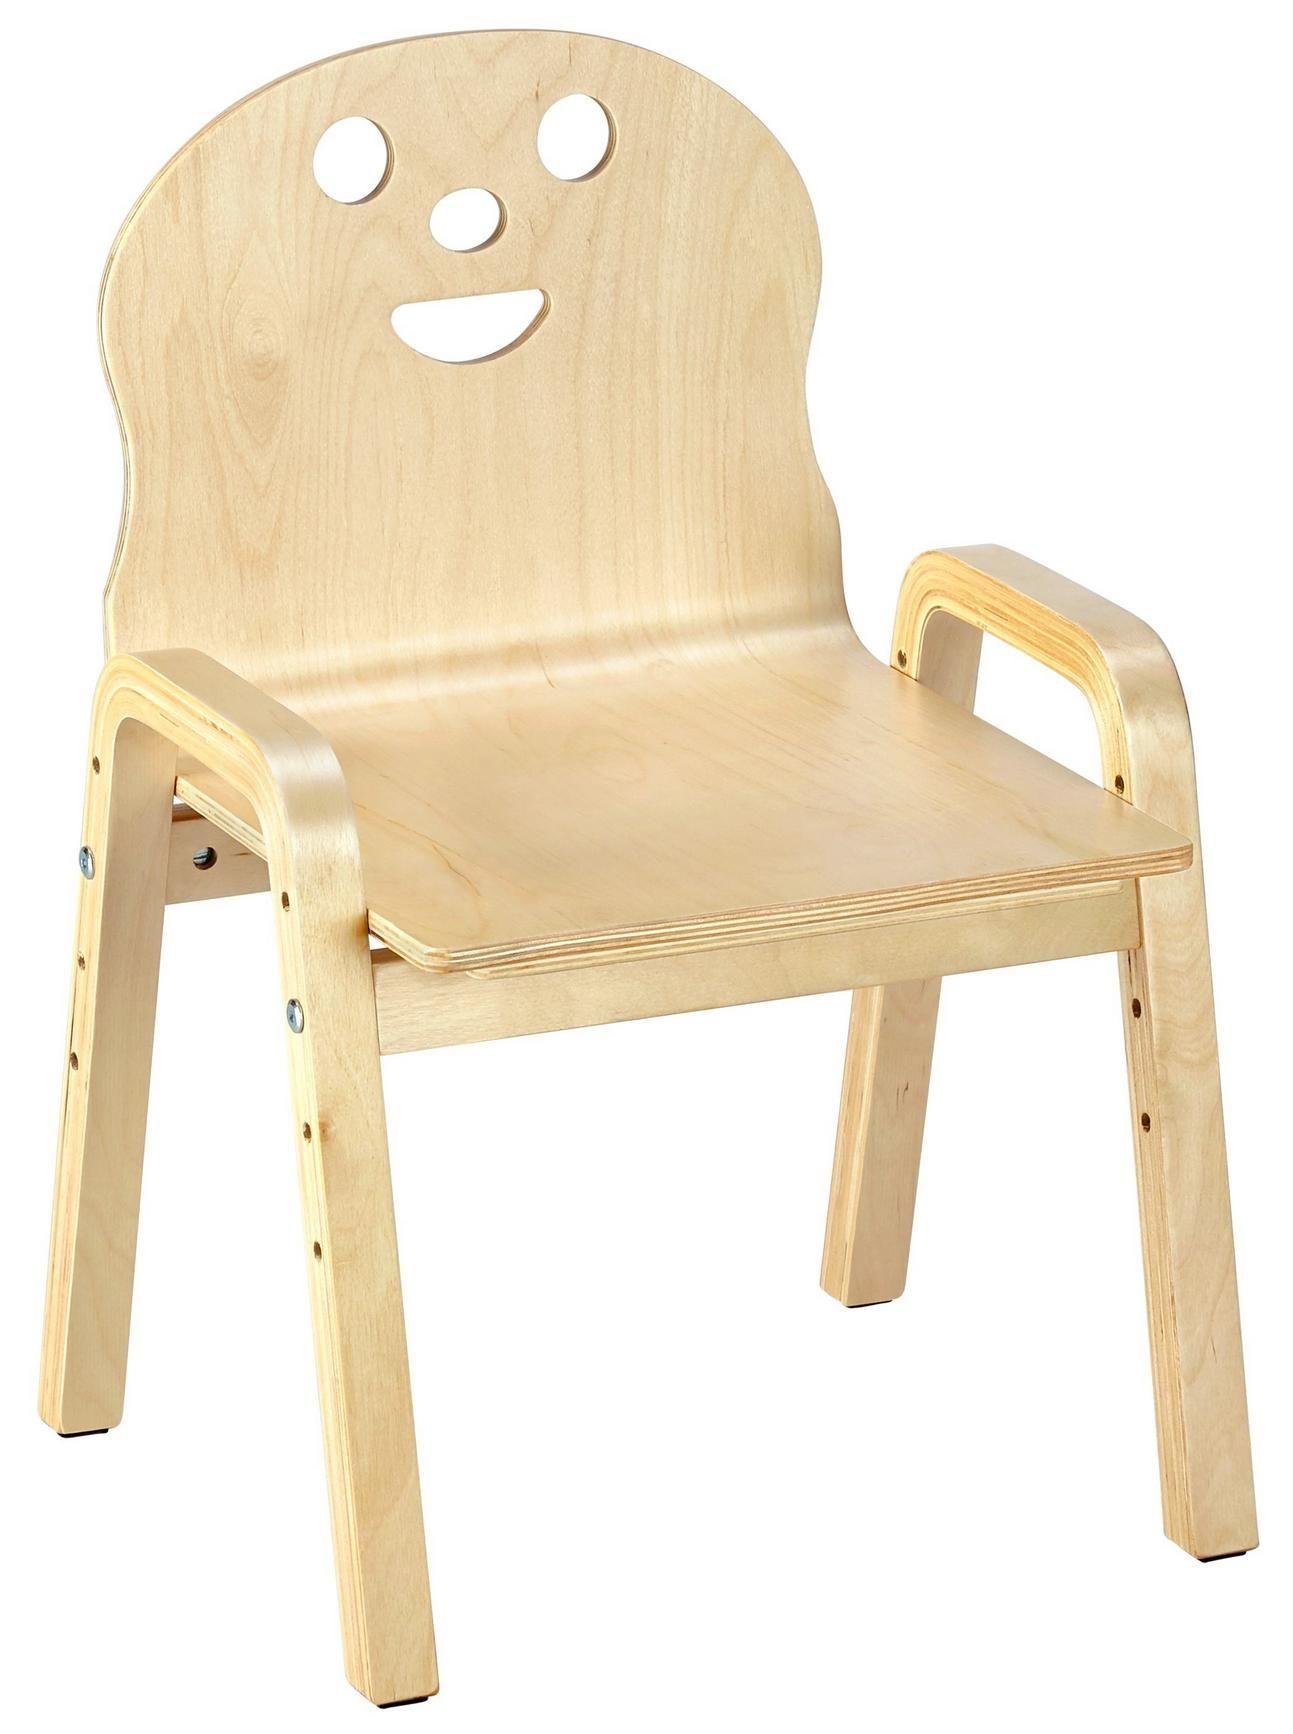 Kinderstuhl In Birkefarben Sunny Stuhle Haus Deko Und Birke Holz